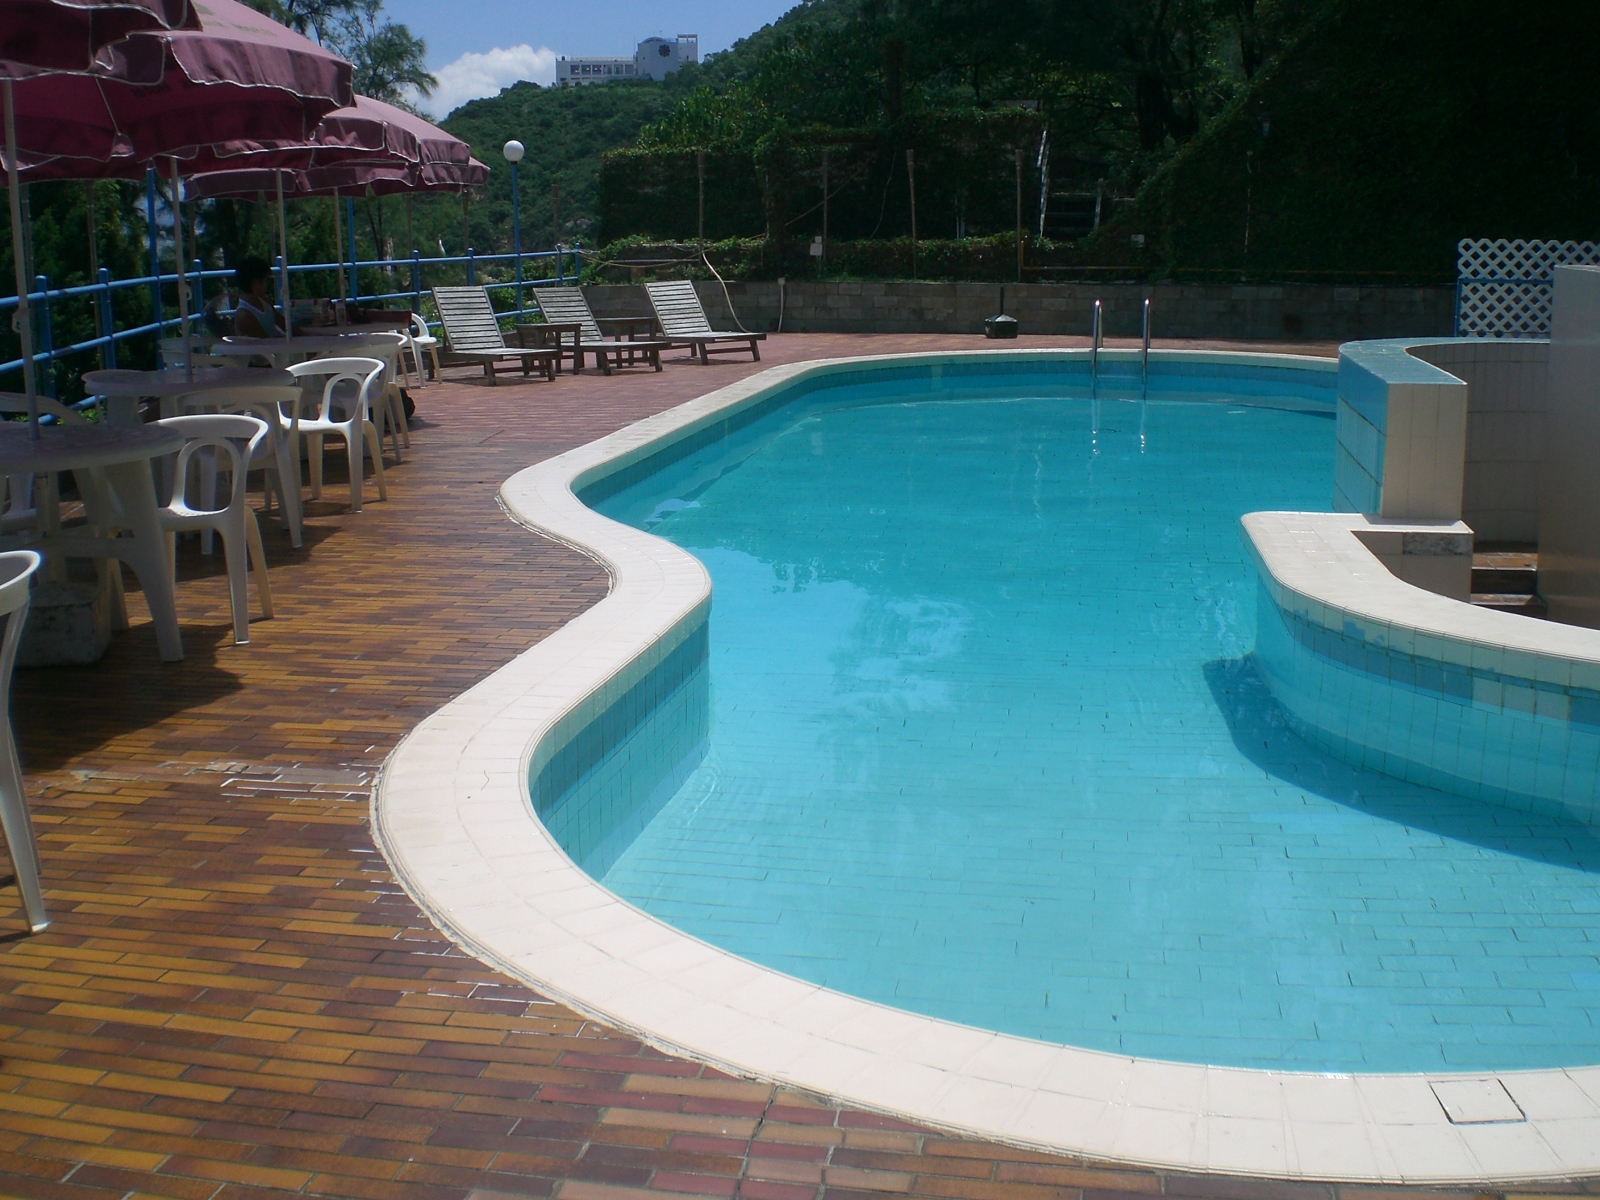 File:HK Cheung Chau Warwick Hotel Swimming Pool 2.JPG - Wikimedia ...